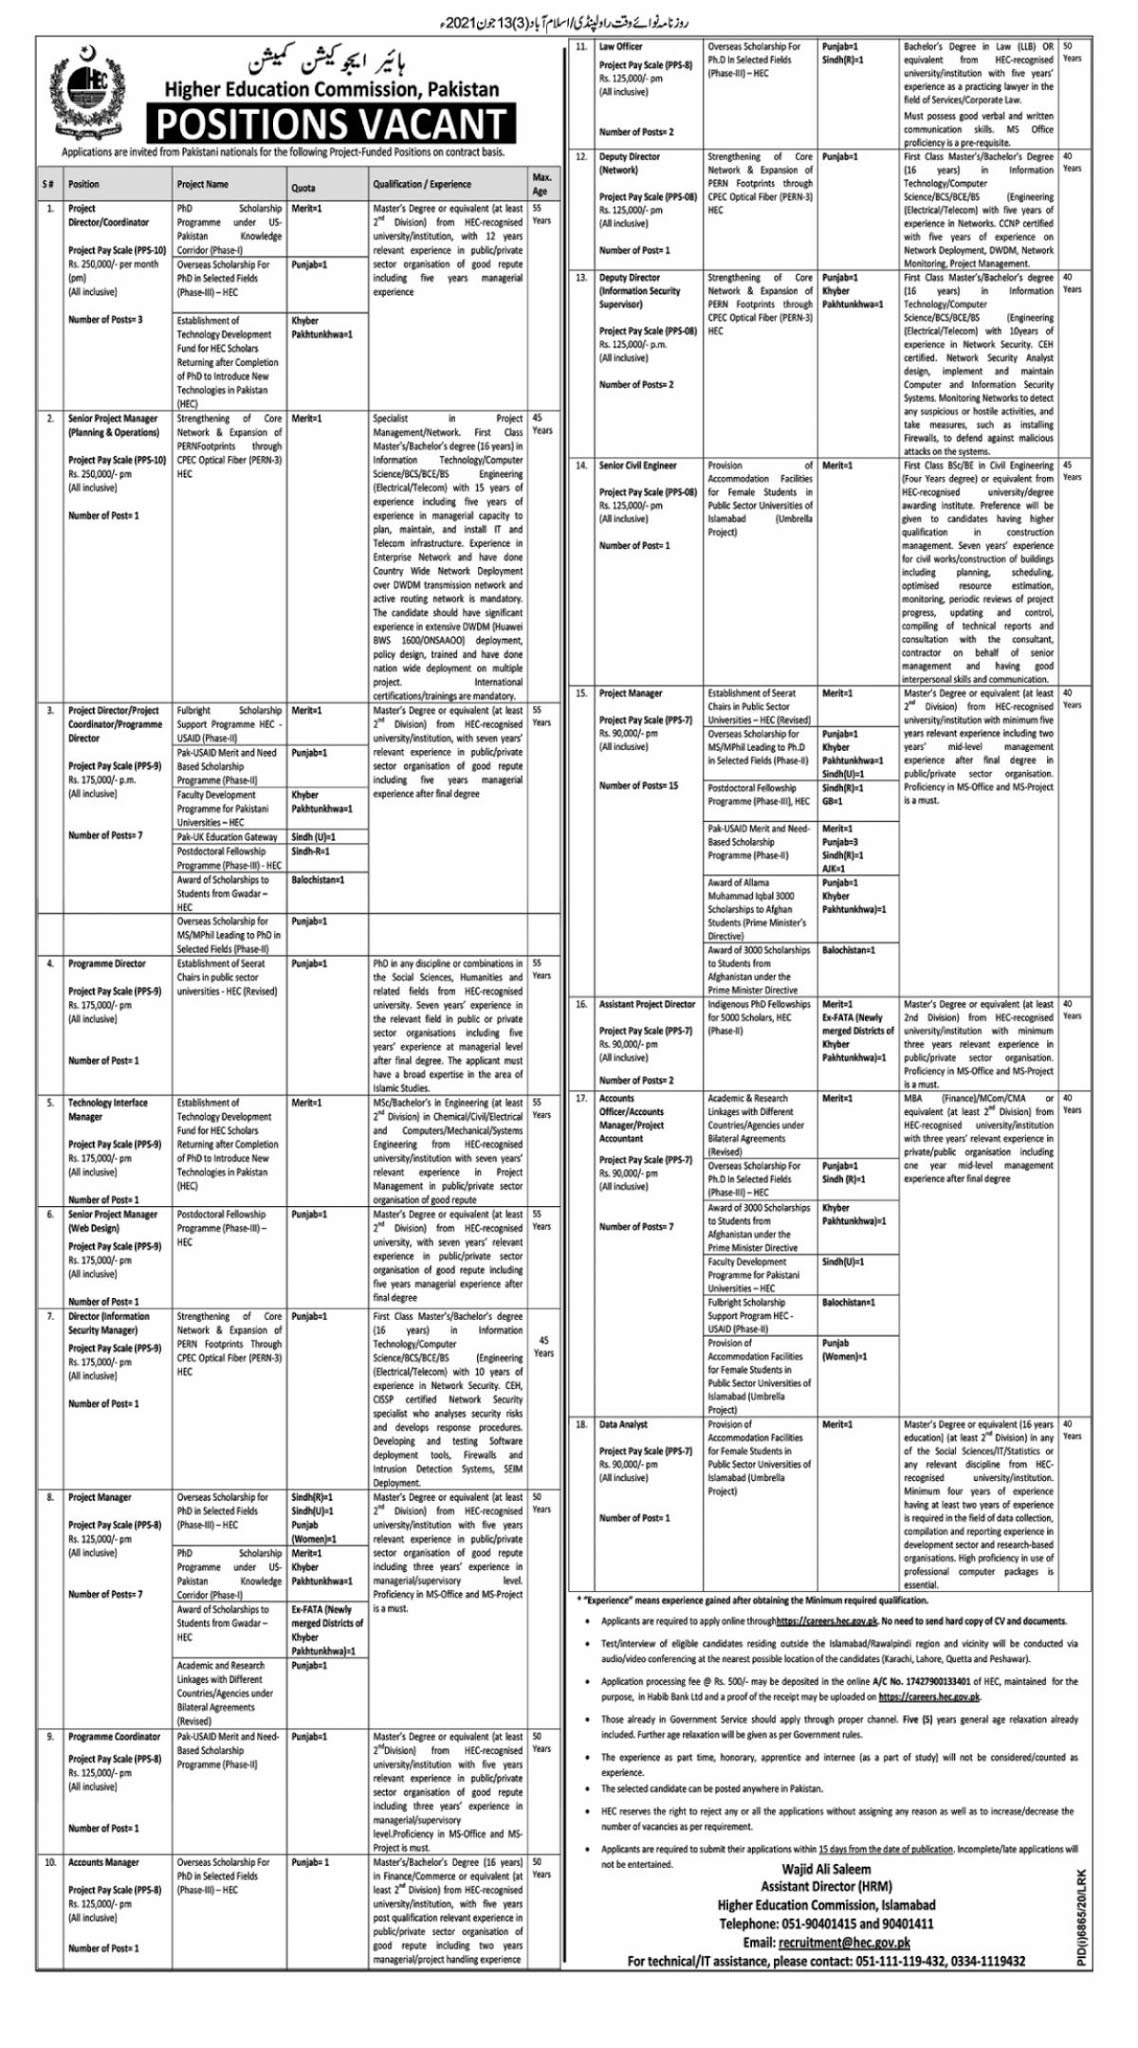 Higher Education Commission Pakistan HEC Latest Jobs 2021 Advertisement - HEC Jobs 2021 Apply Online www.hec.gov.pk